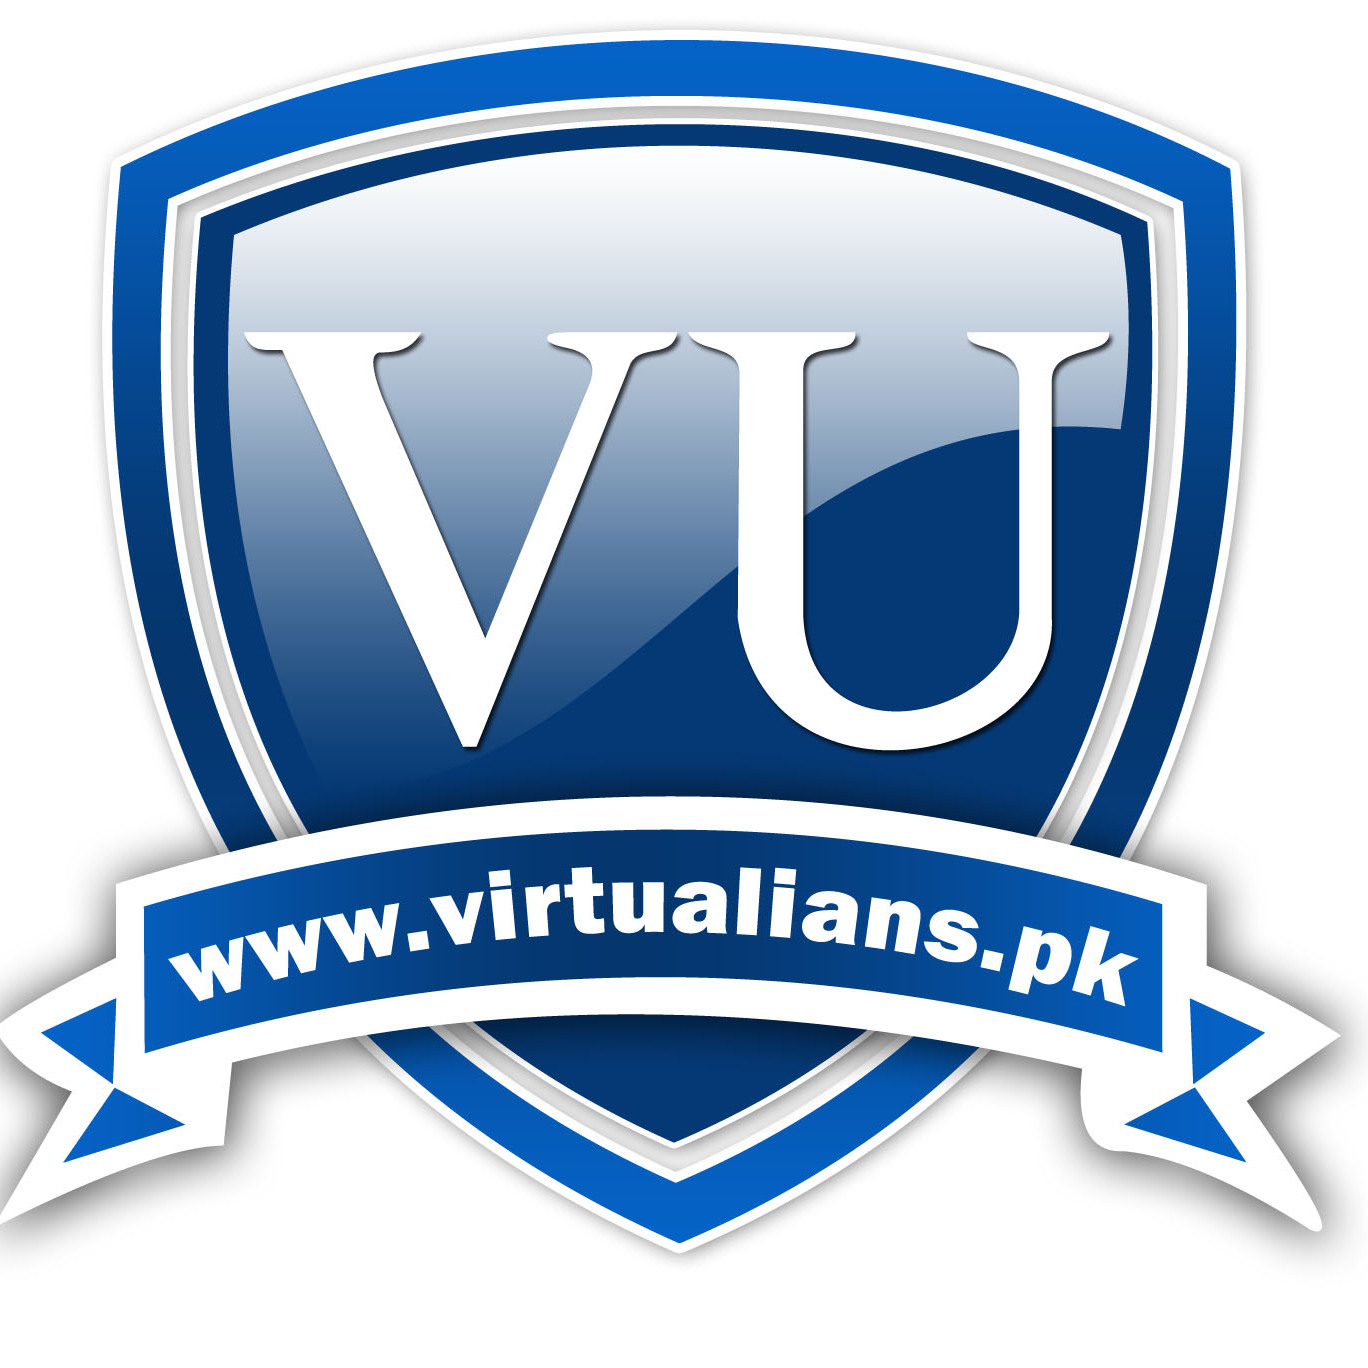 The Rector of Virtual University of Pakistan (VUP) Has died Today, (إِنَّا لِلّهِ وَإِنَّـا إِلَيْهِ رَاجِعونَ)